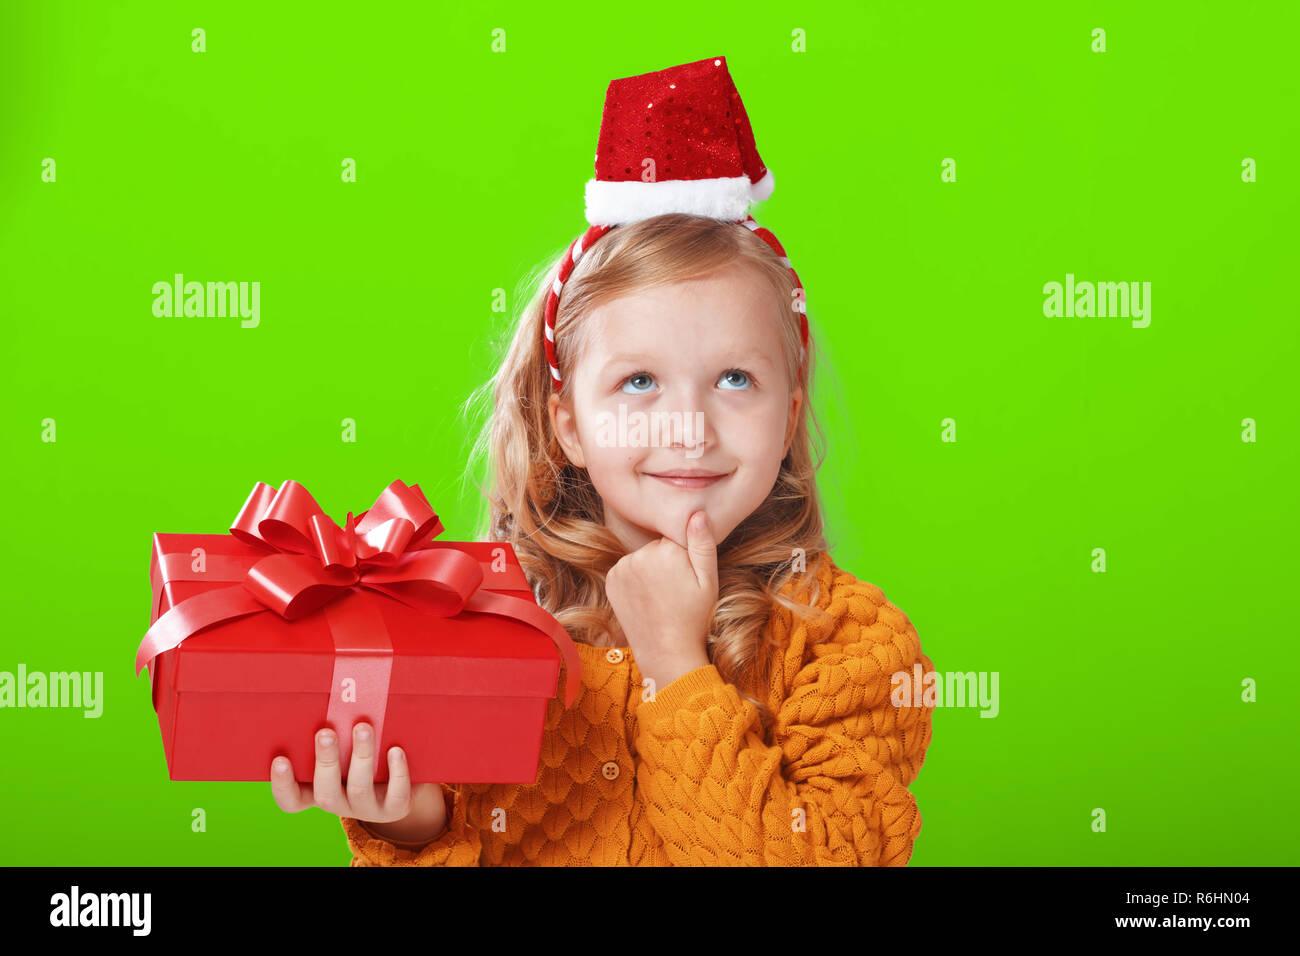 78b6e98d0284d Secret Santa Gift Stock Photos   Secret Santa Gift Stock Images - Alamy